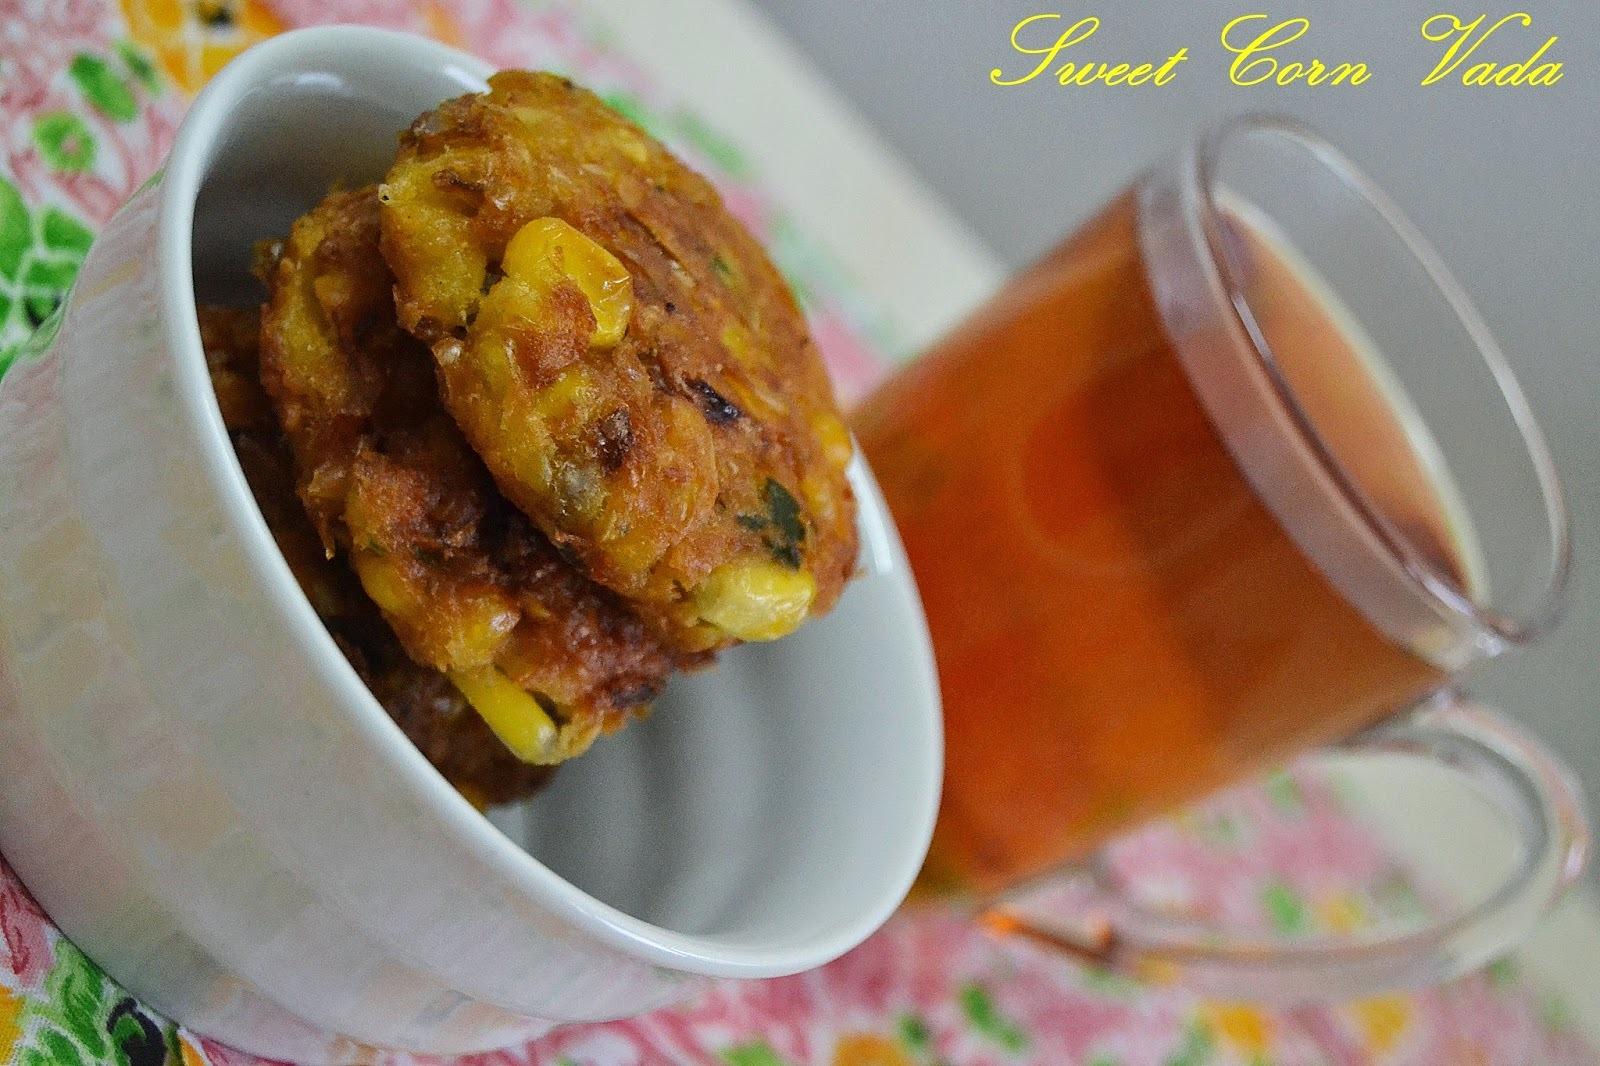 Sweet Corn Vadas